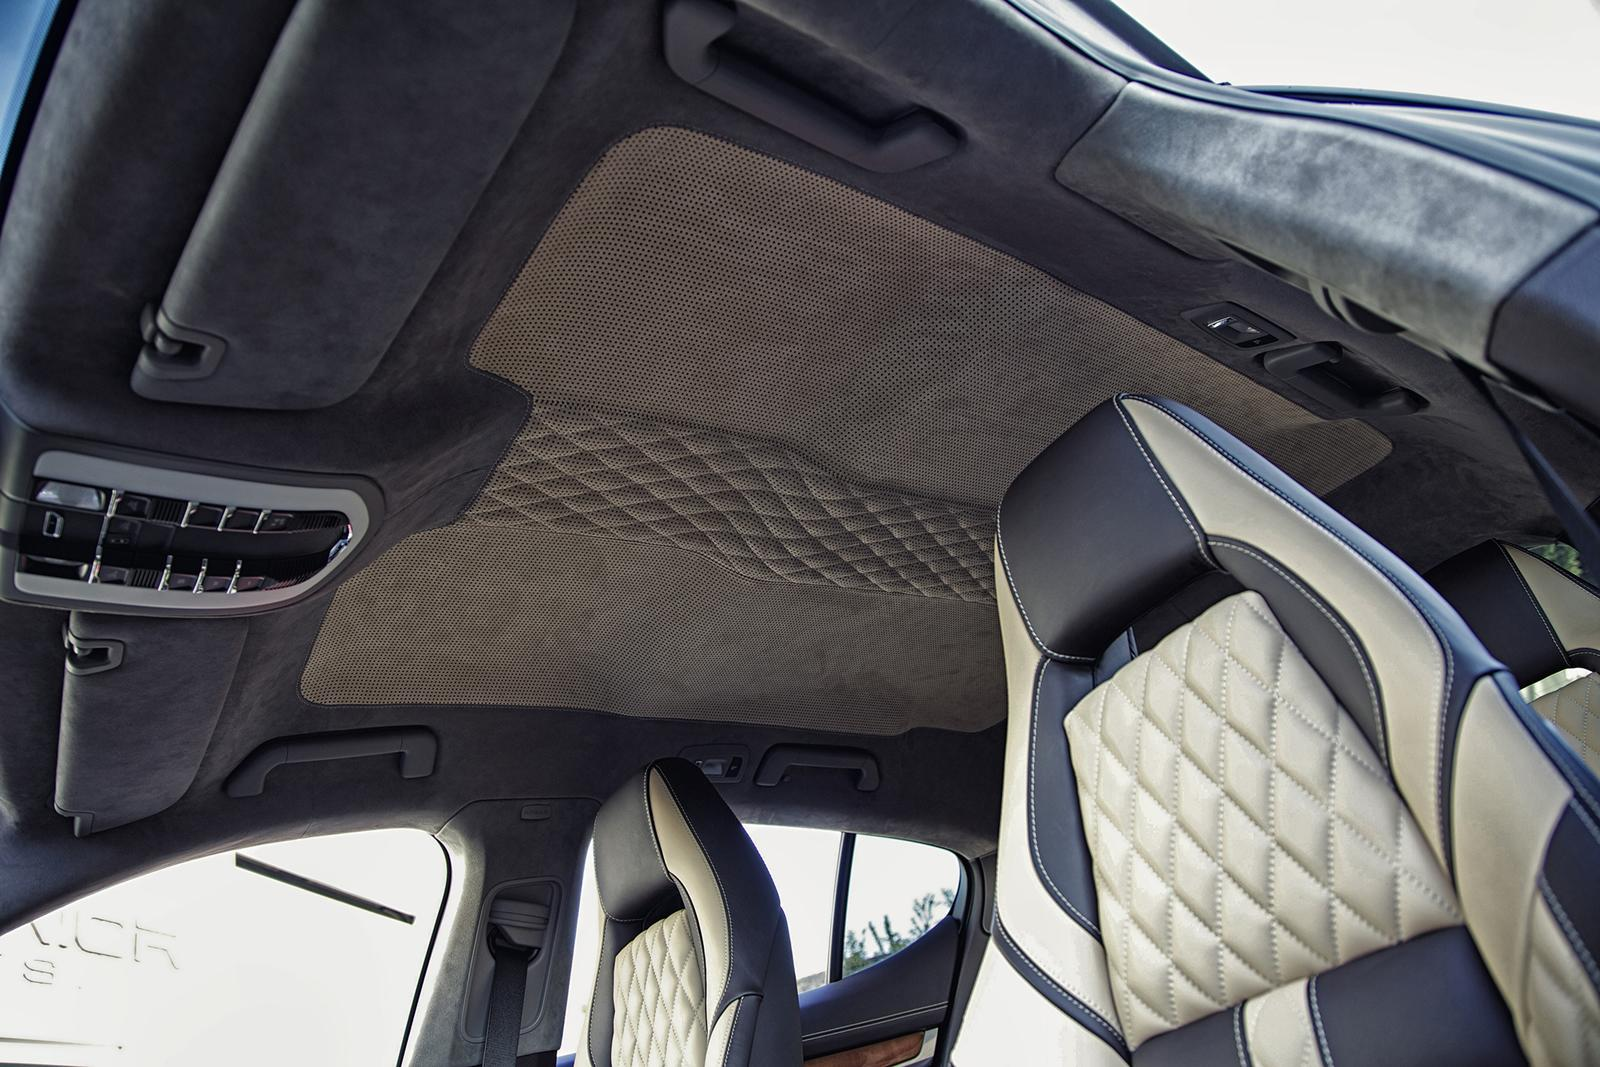 2012 brabus smart fortwo ultimate 120 cabrio. Black Bedroom Furniture Sets. Home Design Ideas